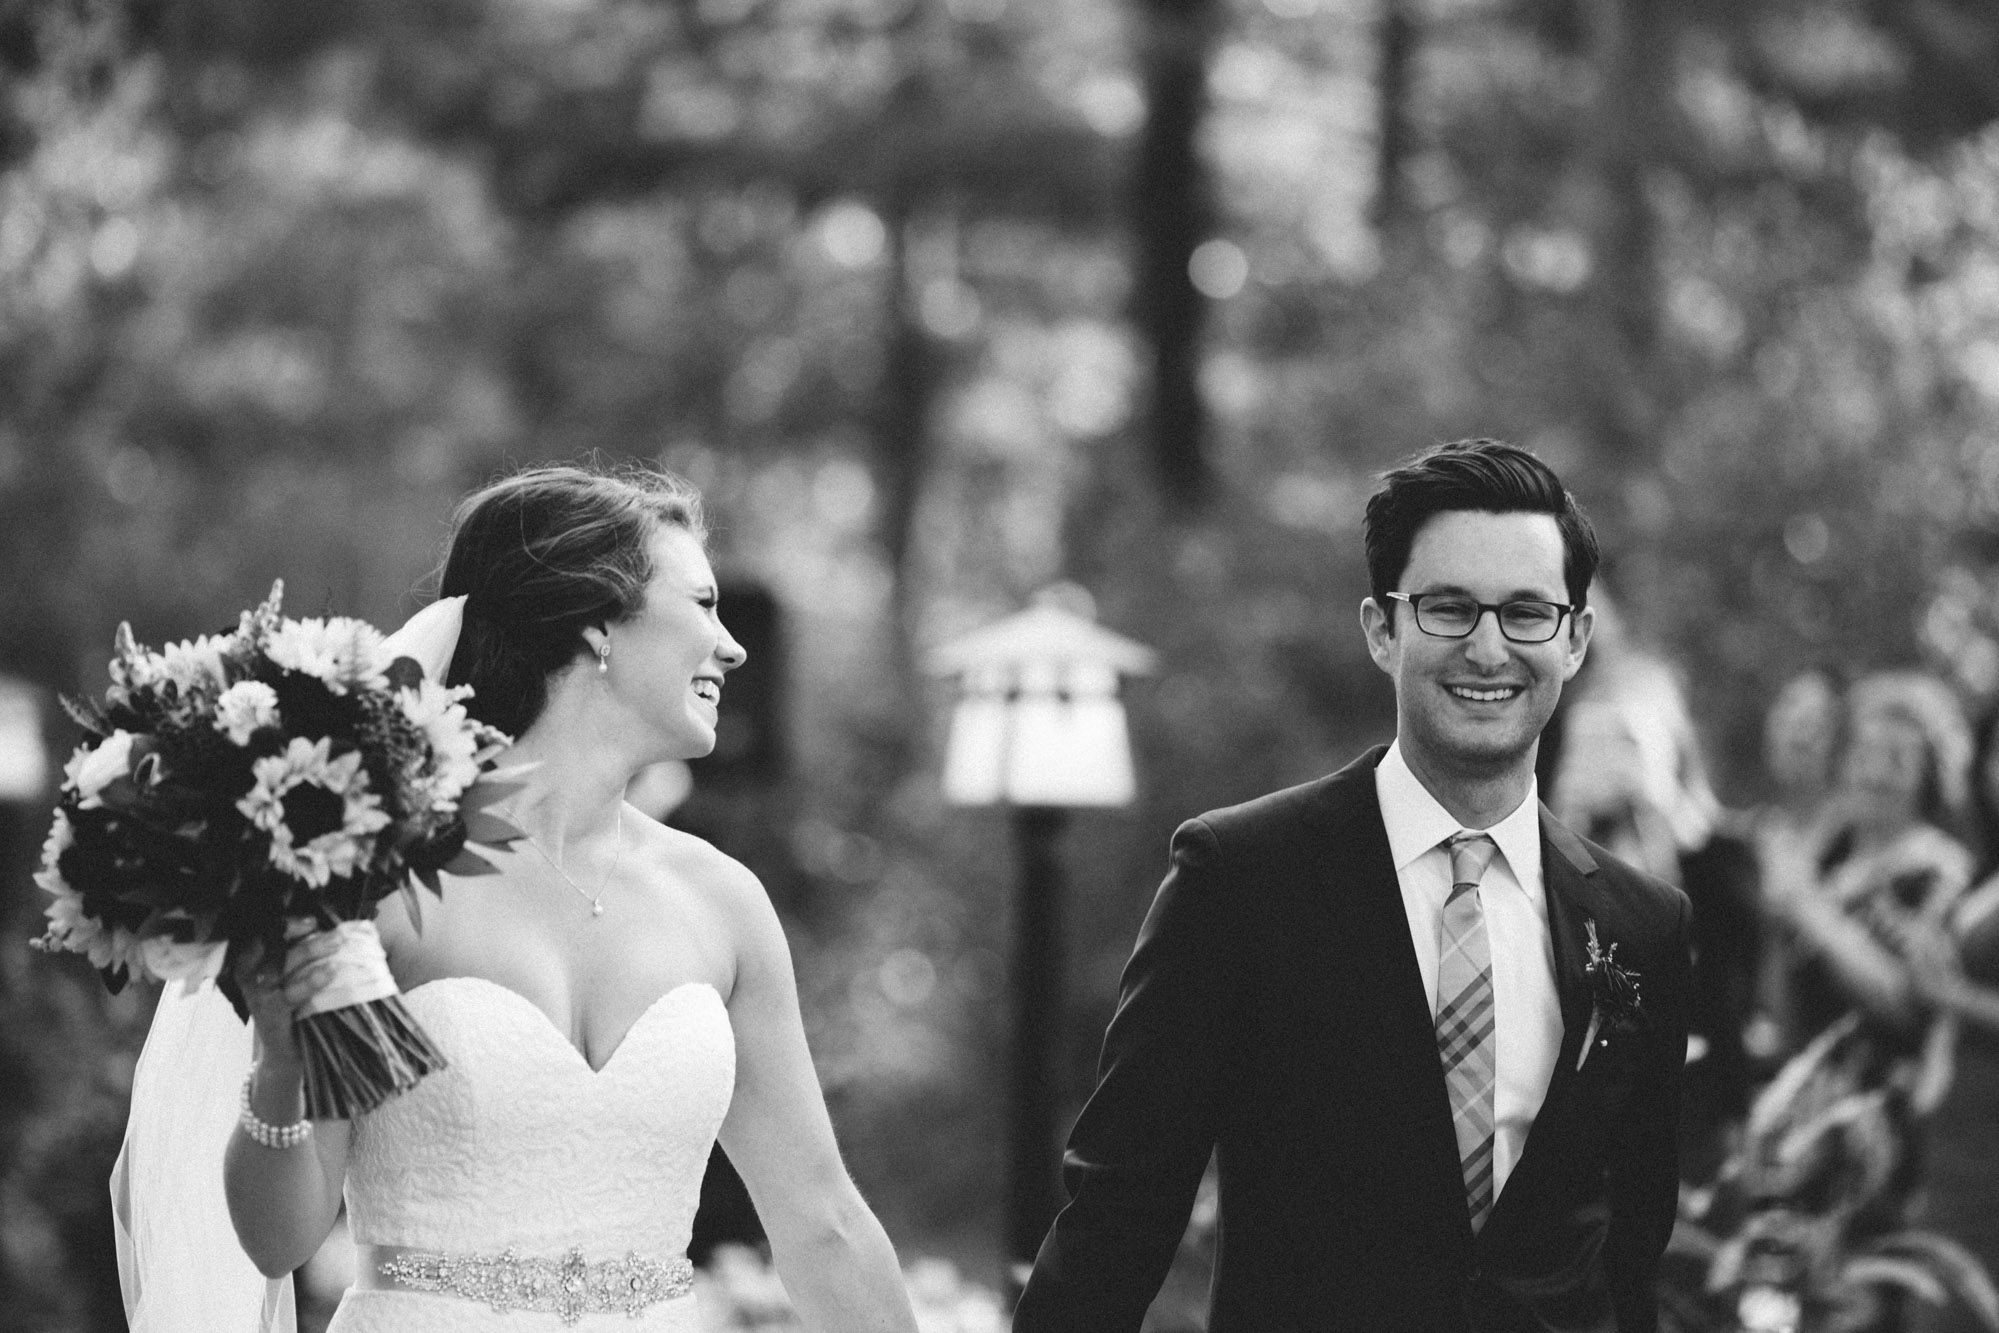 Unposed wedding photography by Britt DeZeeuw, Grand View Lodge photographer